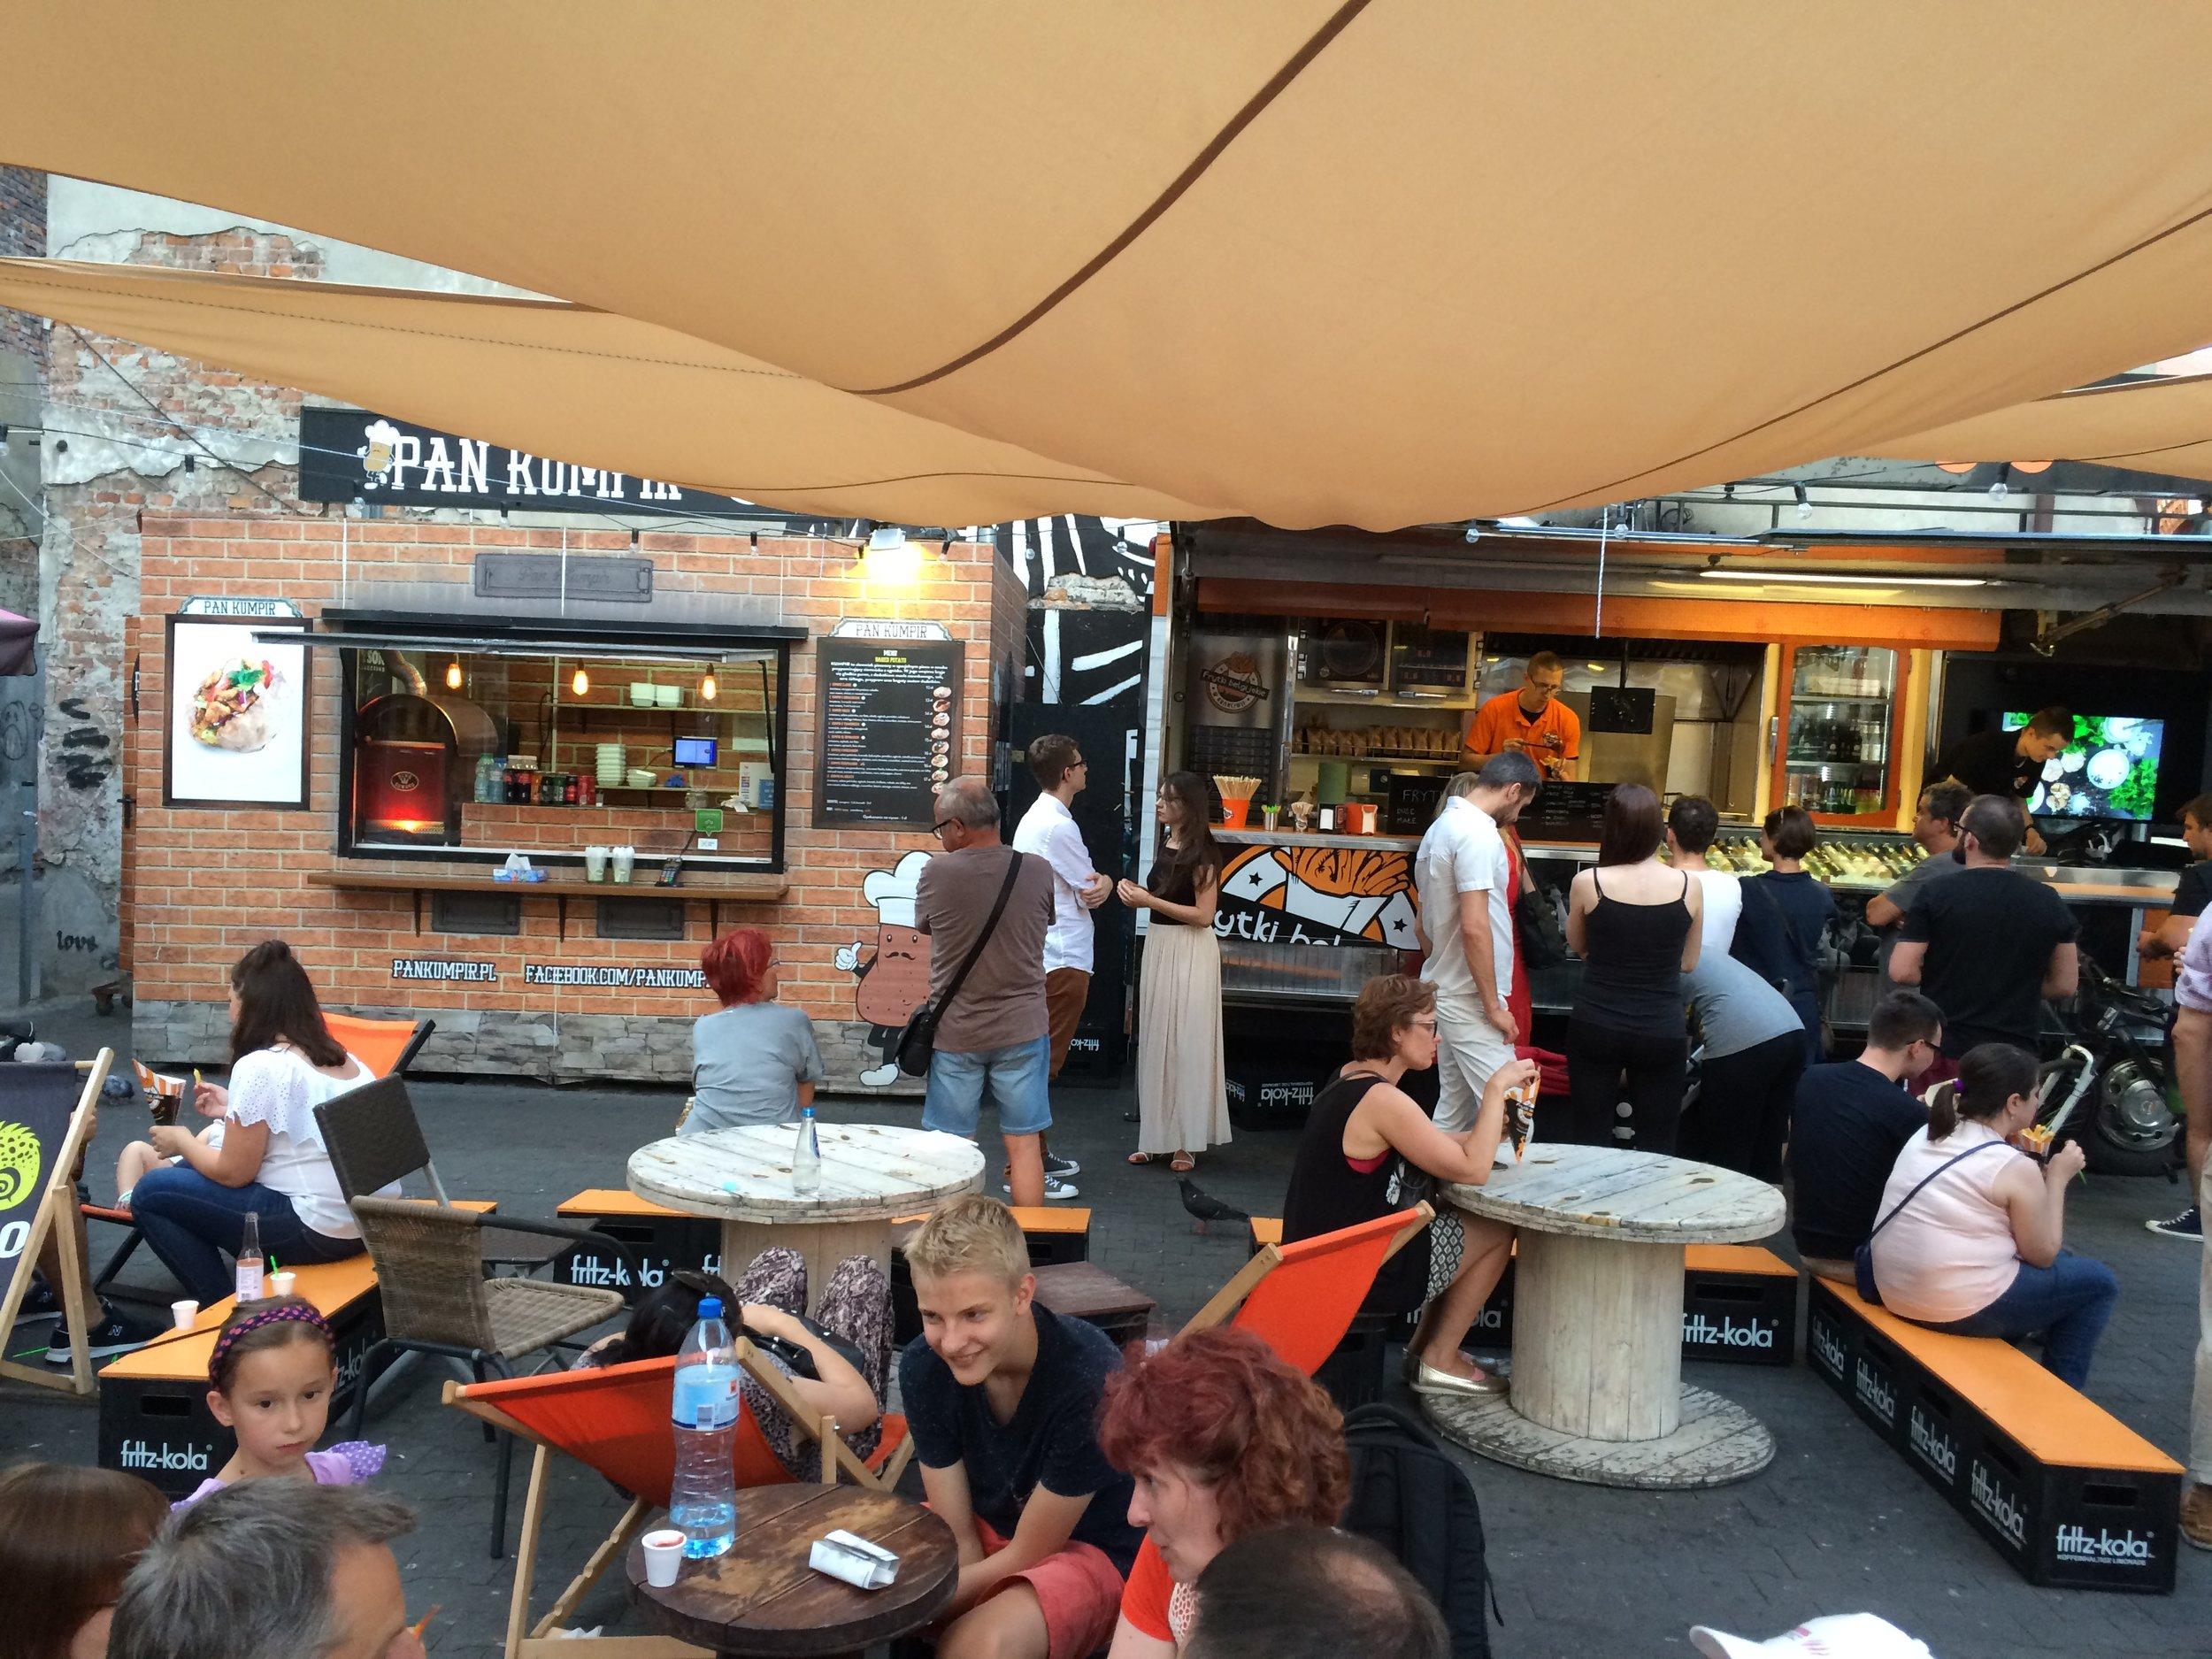 Food court in Krakow, Poland (Photo by Sarah Kobos)